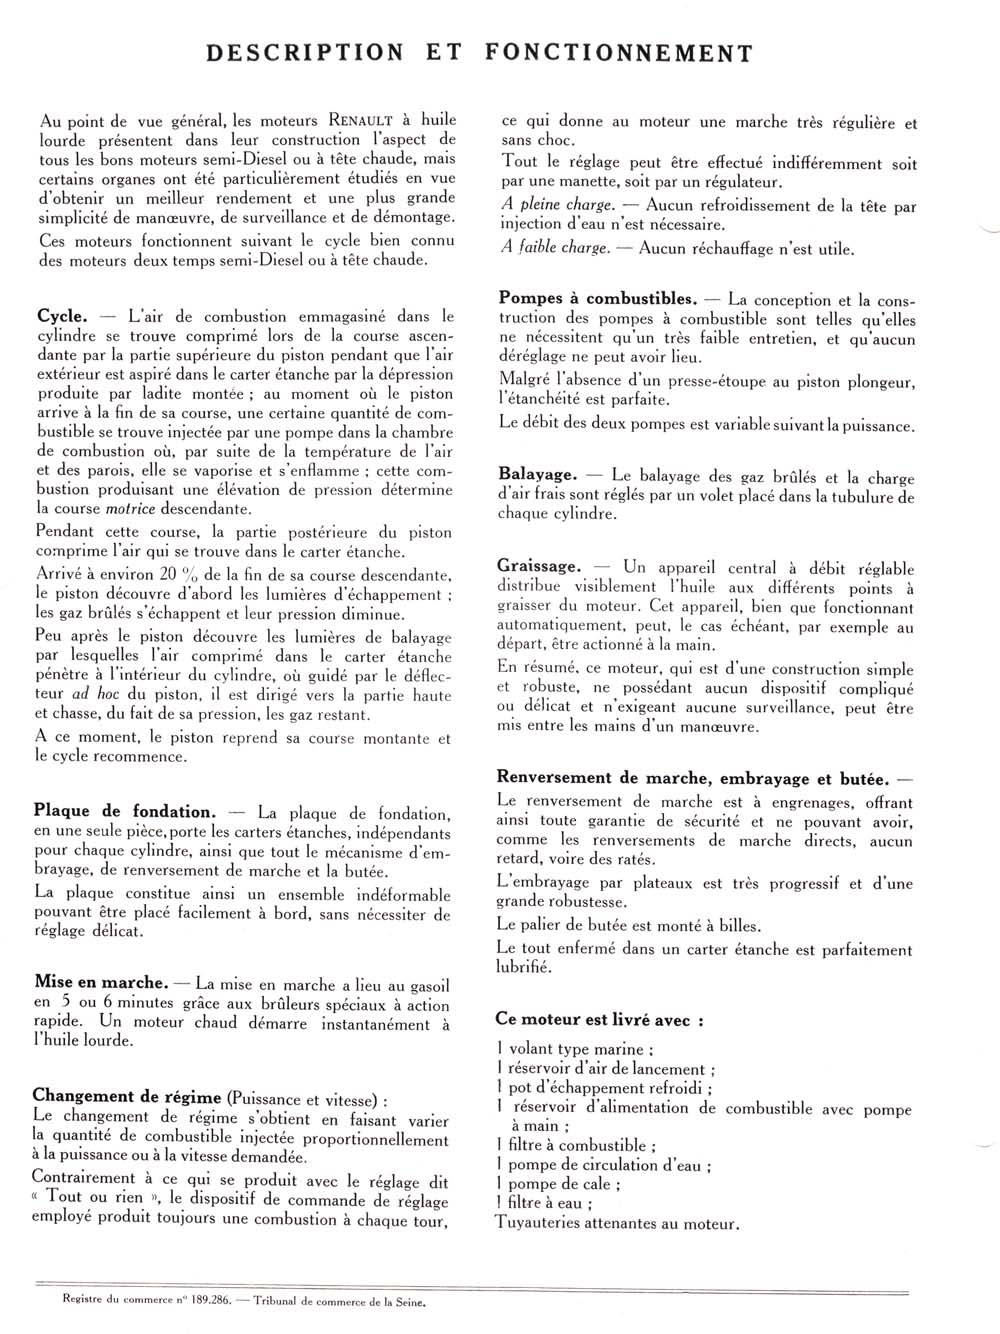 moteur_marine_demidiesel_100cv_2